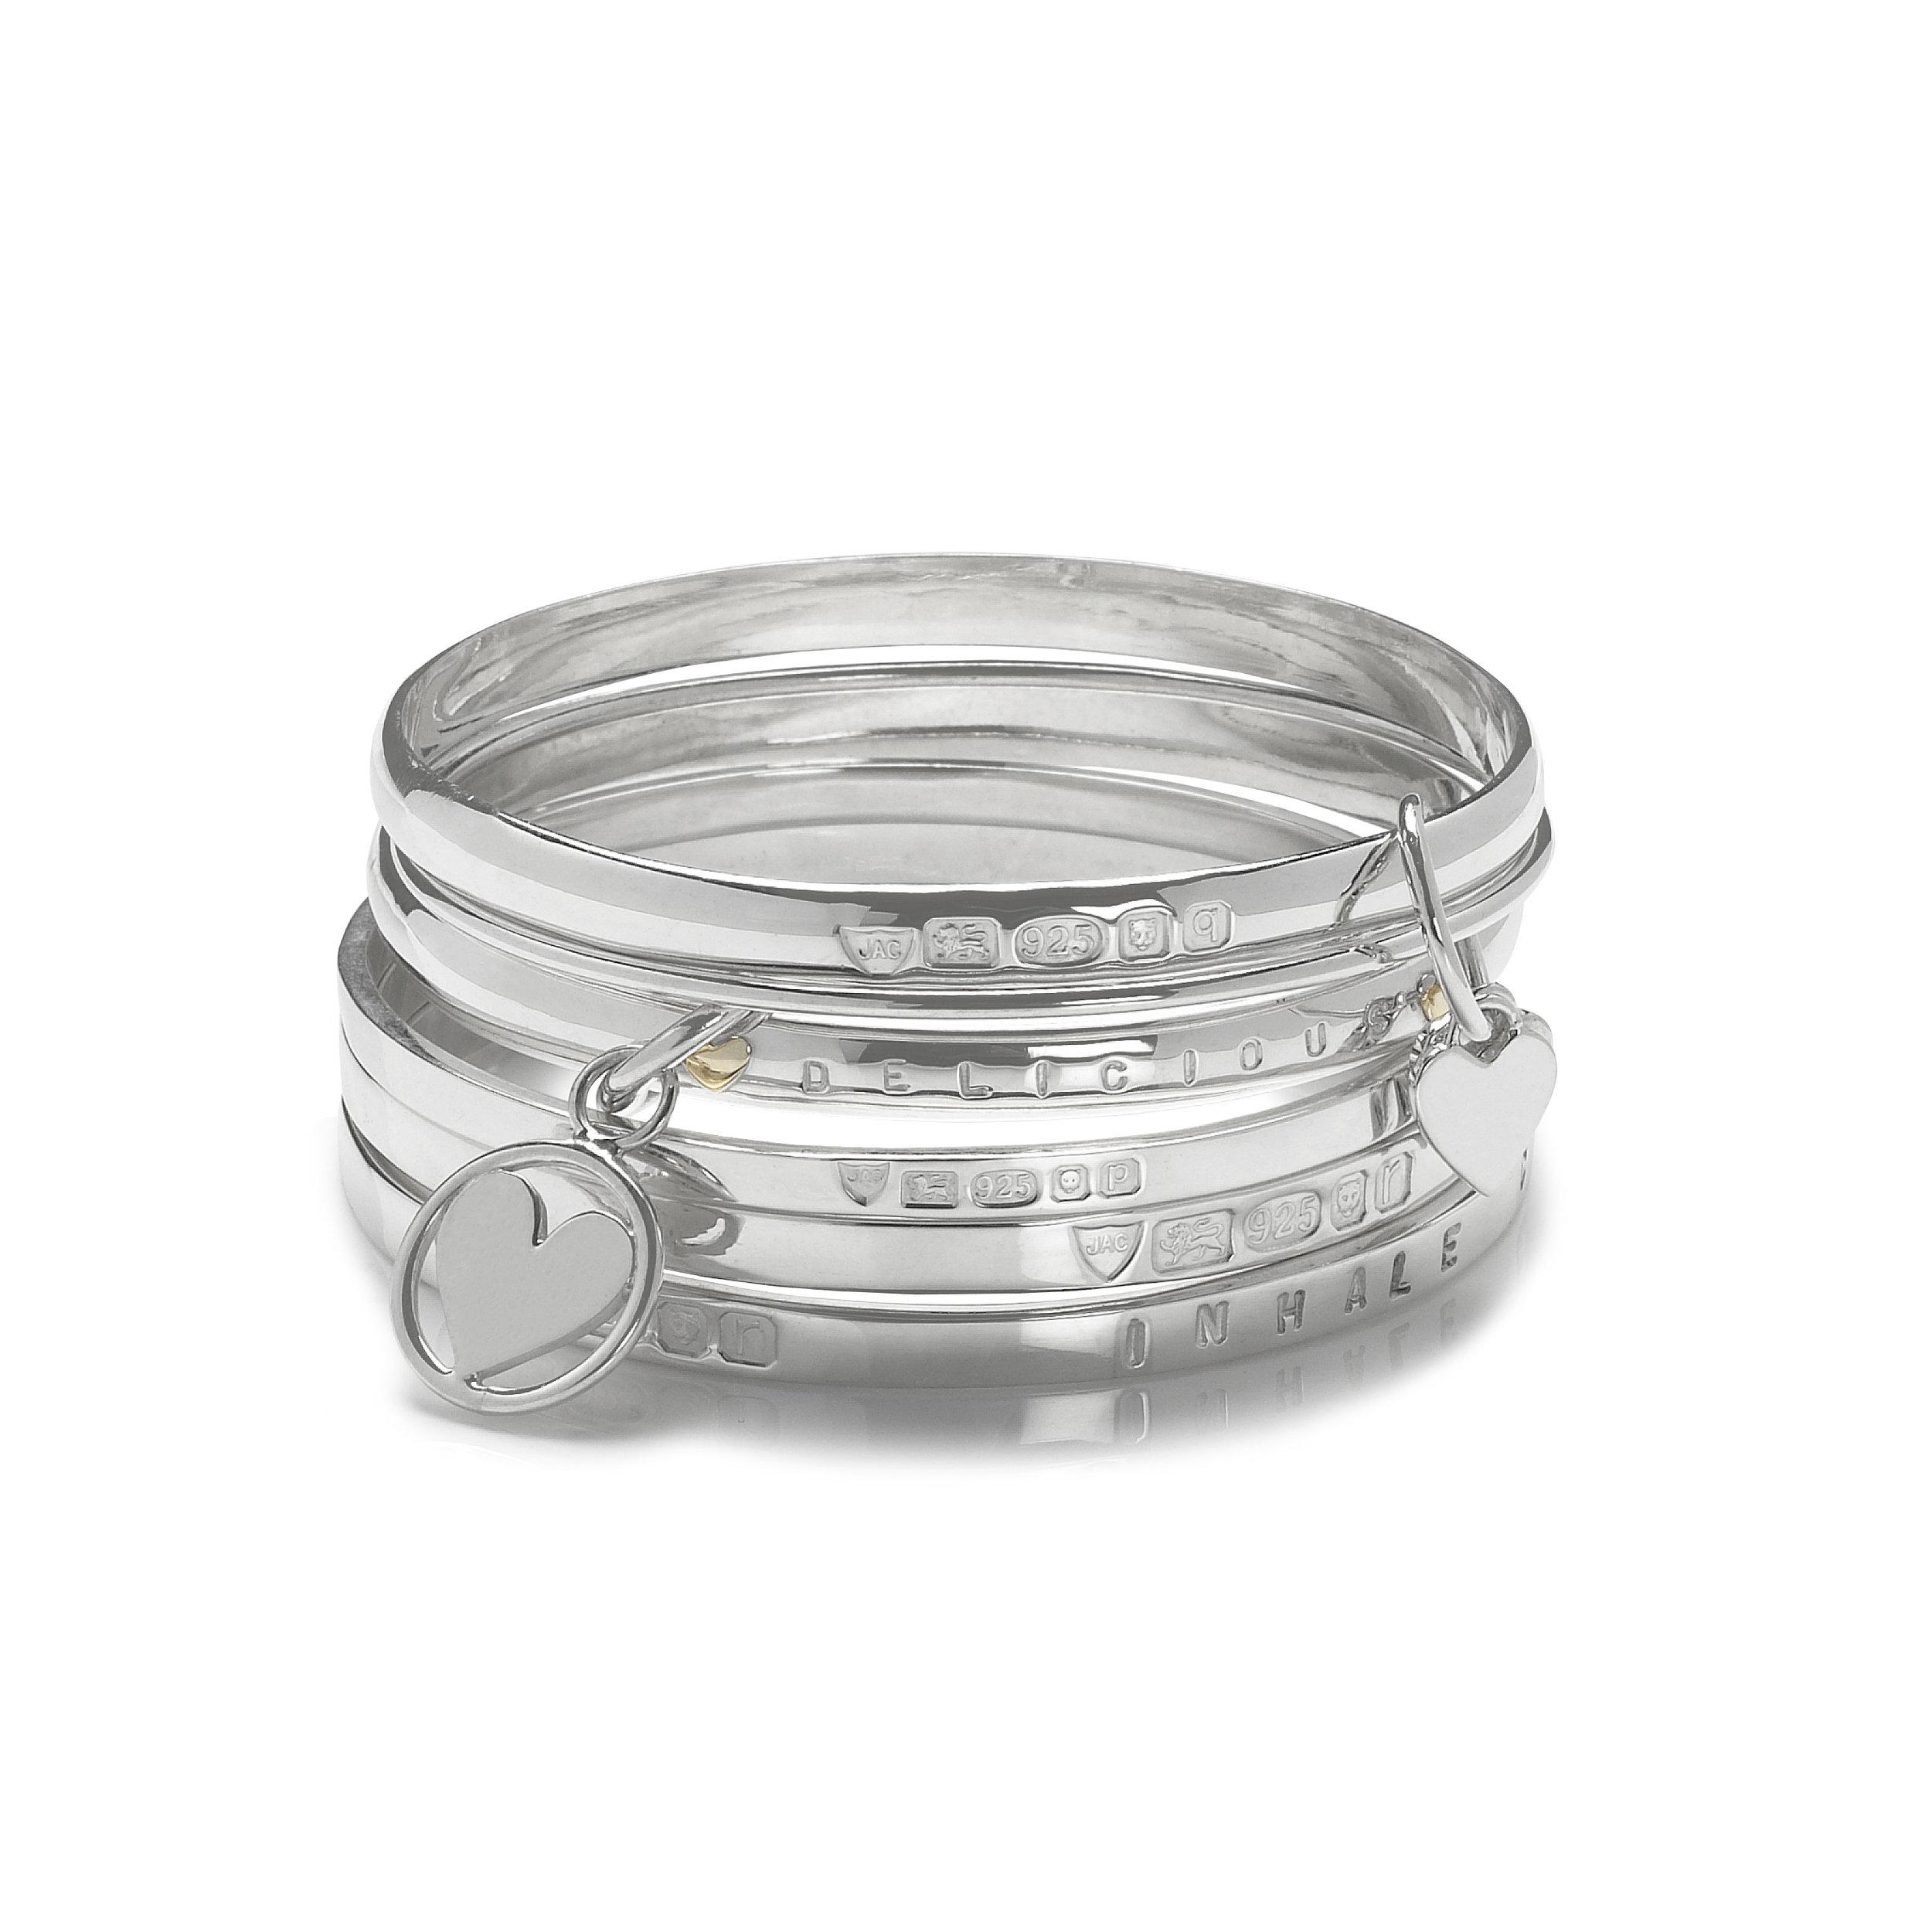 cassandro-london-silver-stack-handmade.jpg